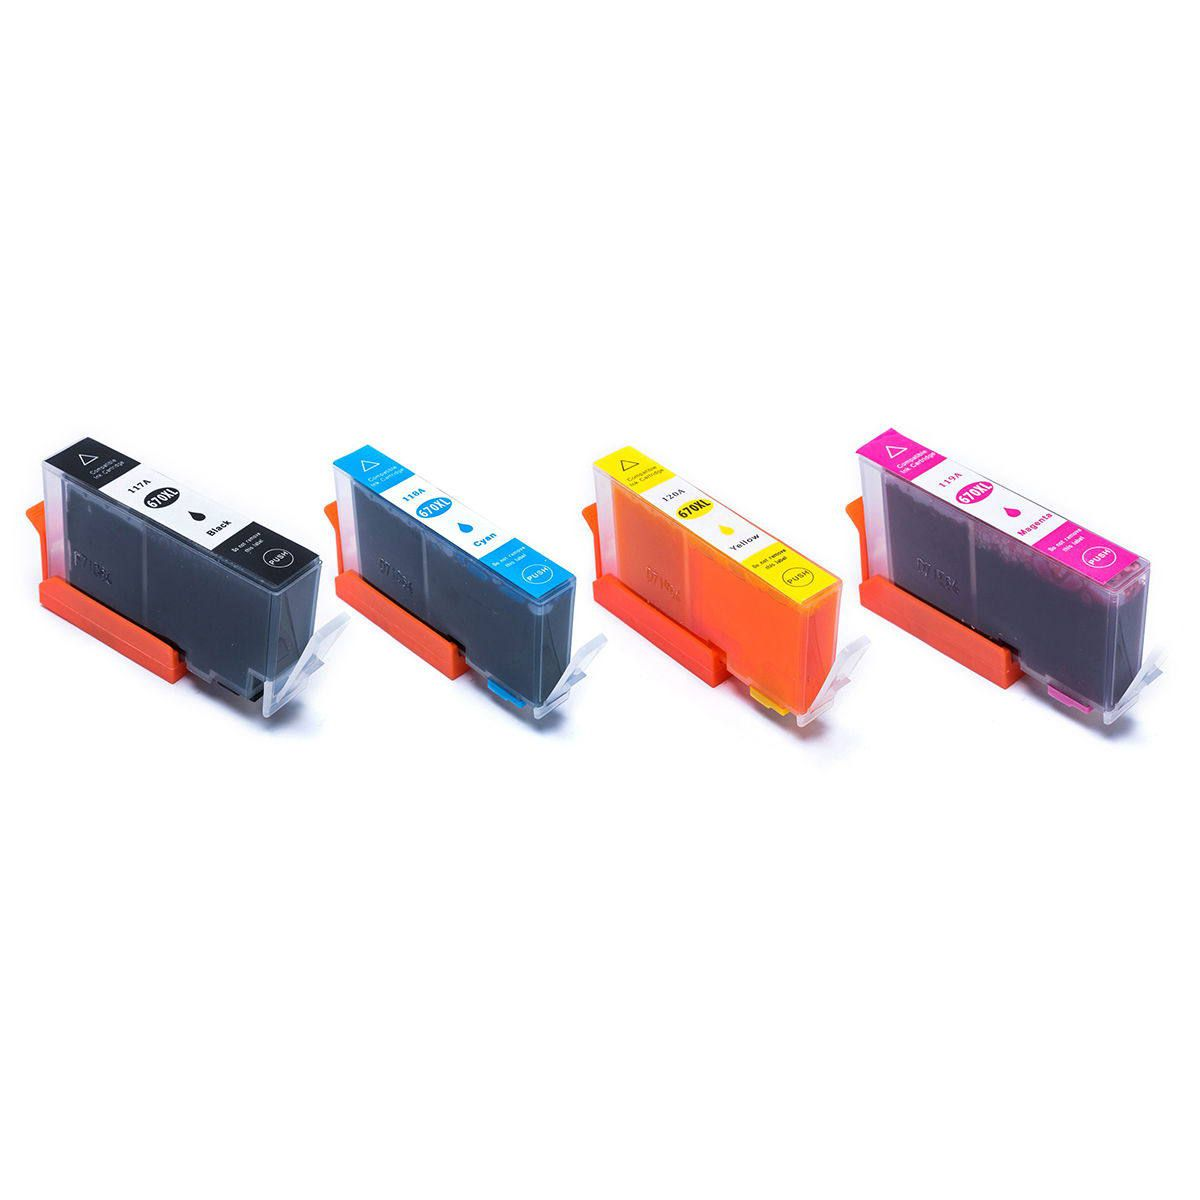 Compatível: Kit Colorido de Cartucho de Tinta 670xl 670 para impressora HP Ink Advantage 3525 4615 4625 5525 6520 6525